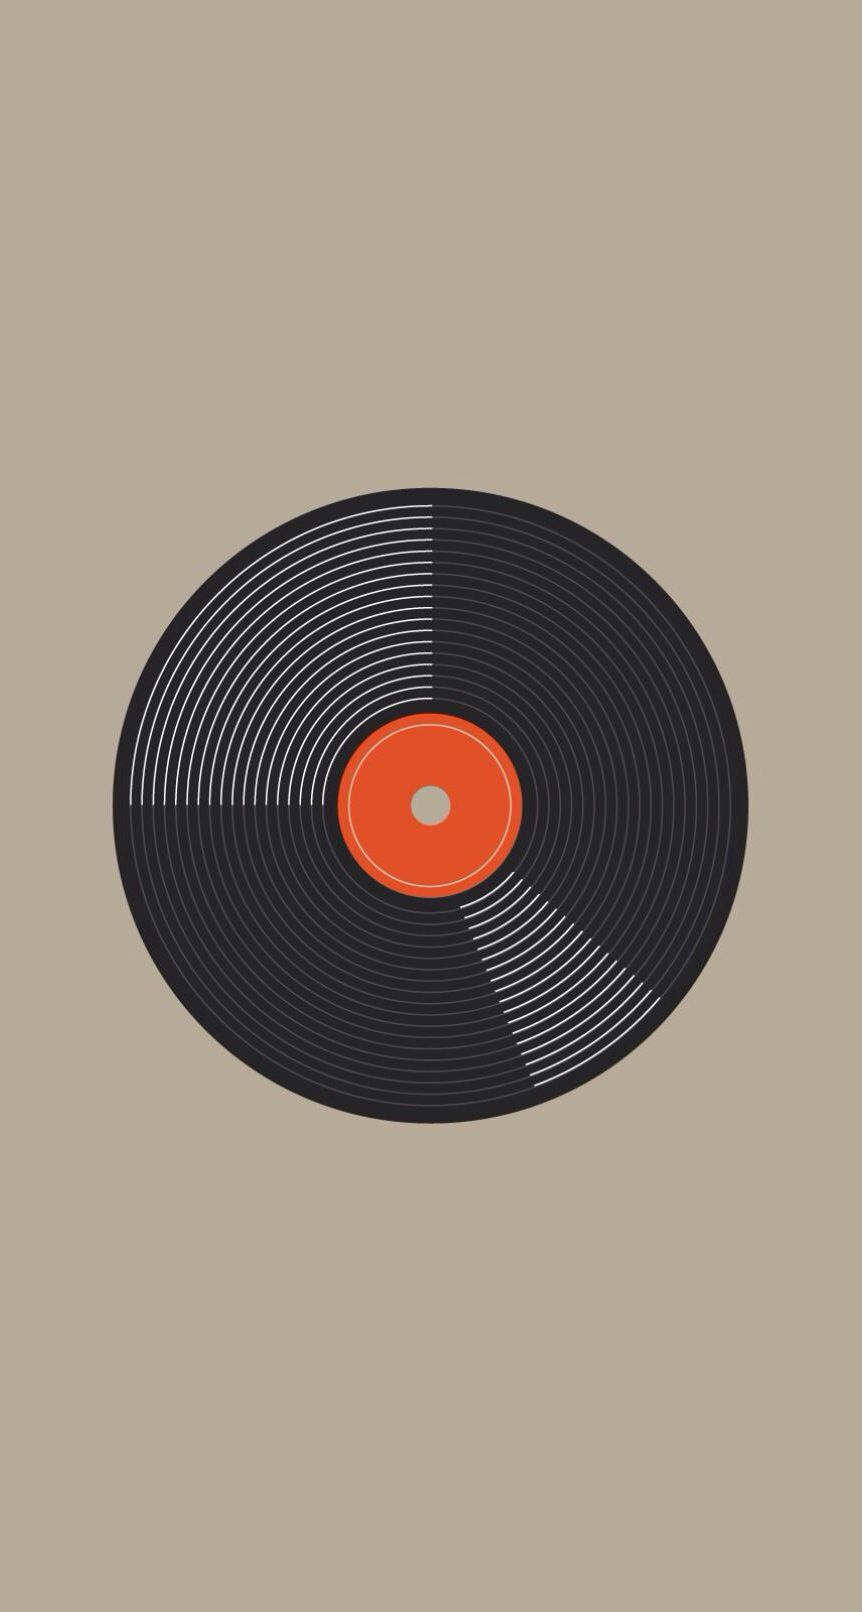 Vinyl Iphone Wallpaper Vinyl Record Art Wallpaper Iphone